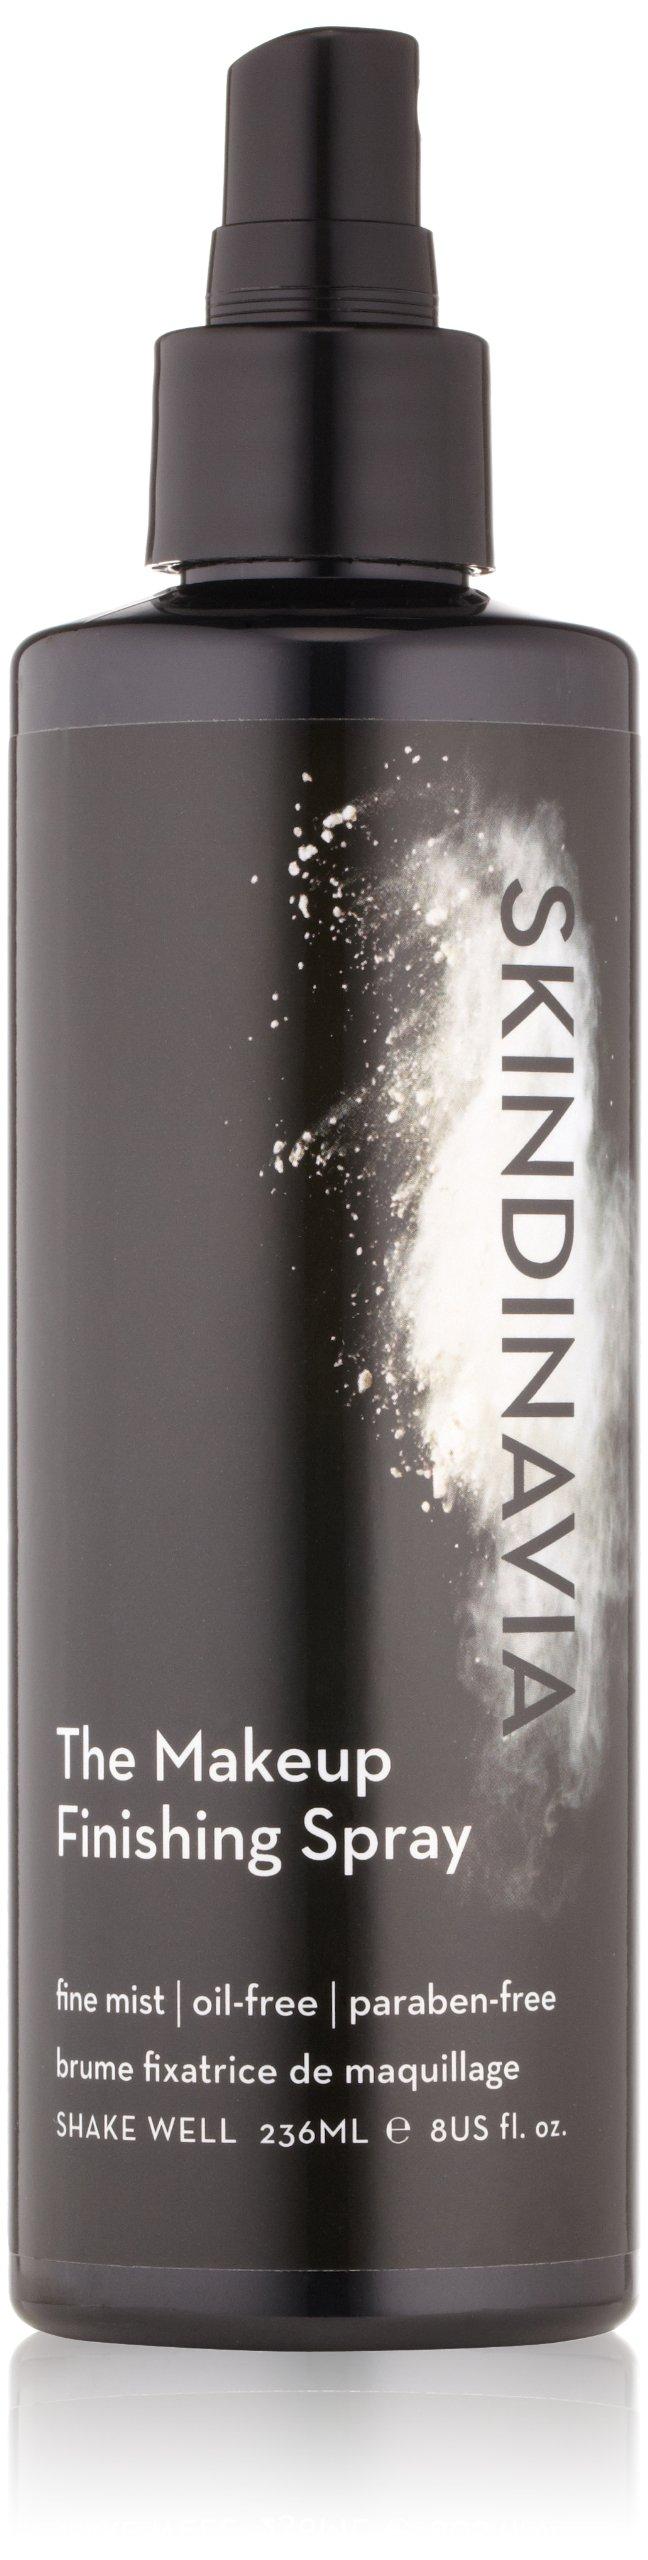 Skindinavia The Makeup Finishing Spray, 8 Fluid Ounce